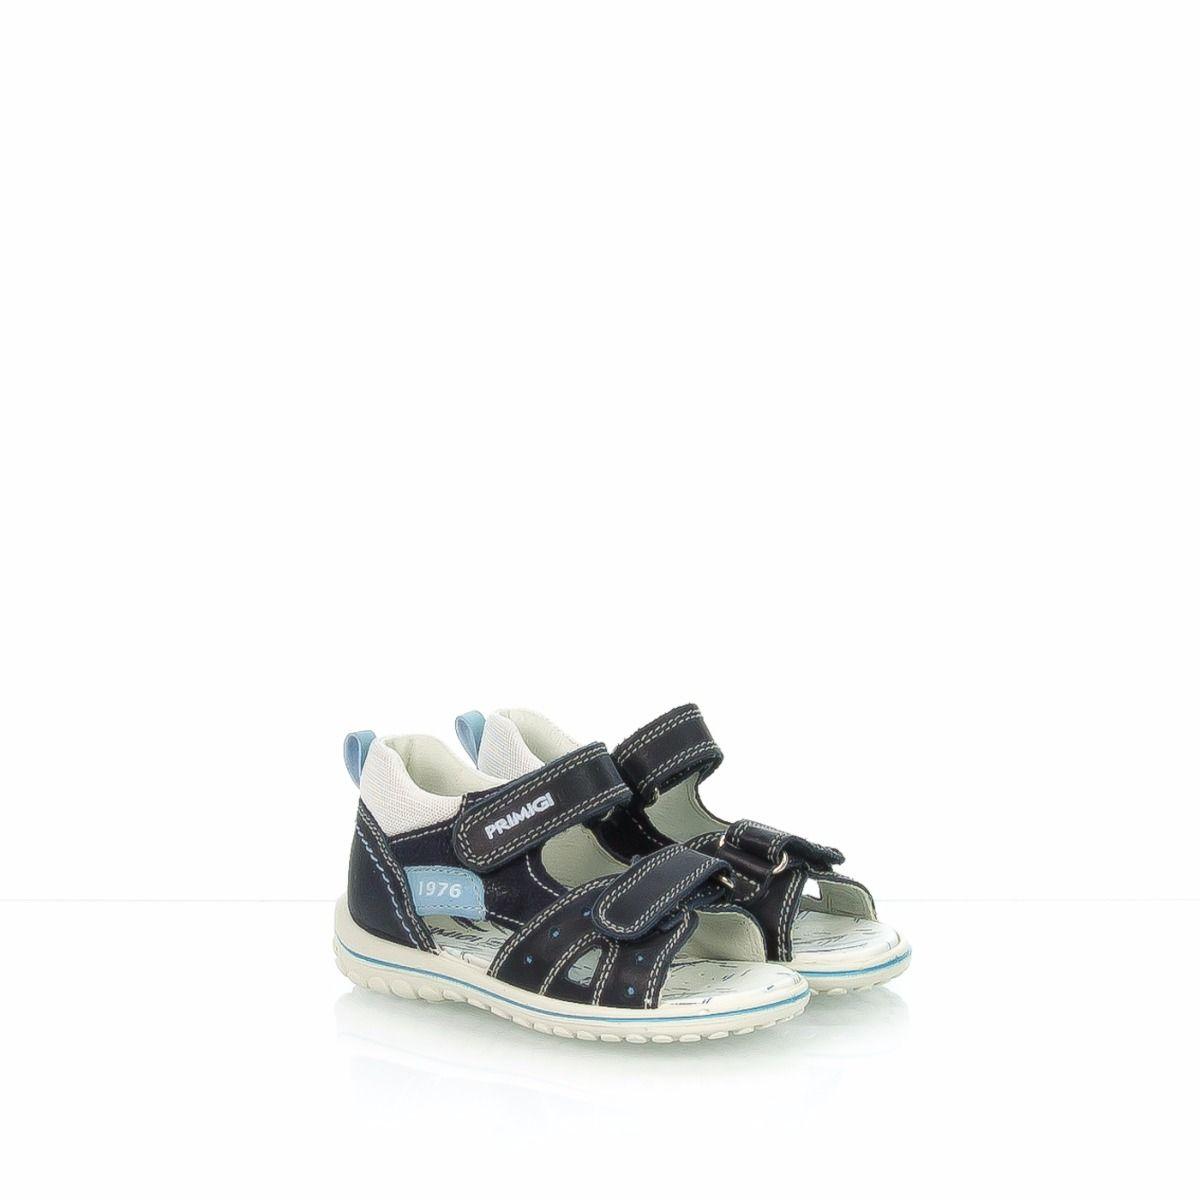 Sandalo Pelle Da In PrimigiZona Treviso Blu Bambino pMqSUzV